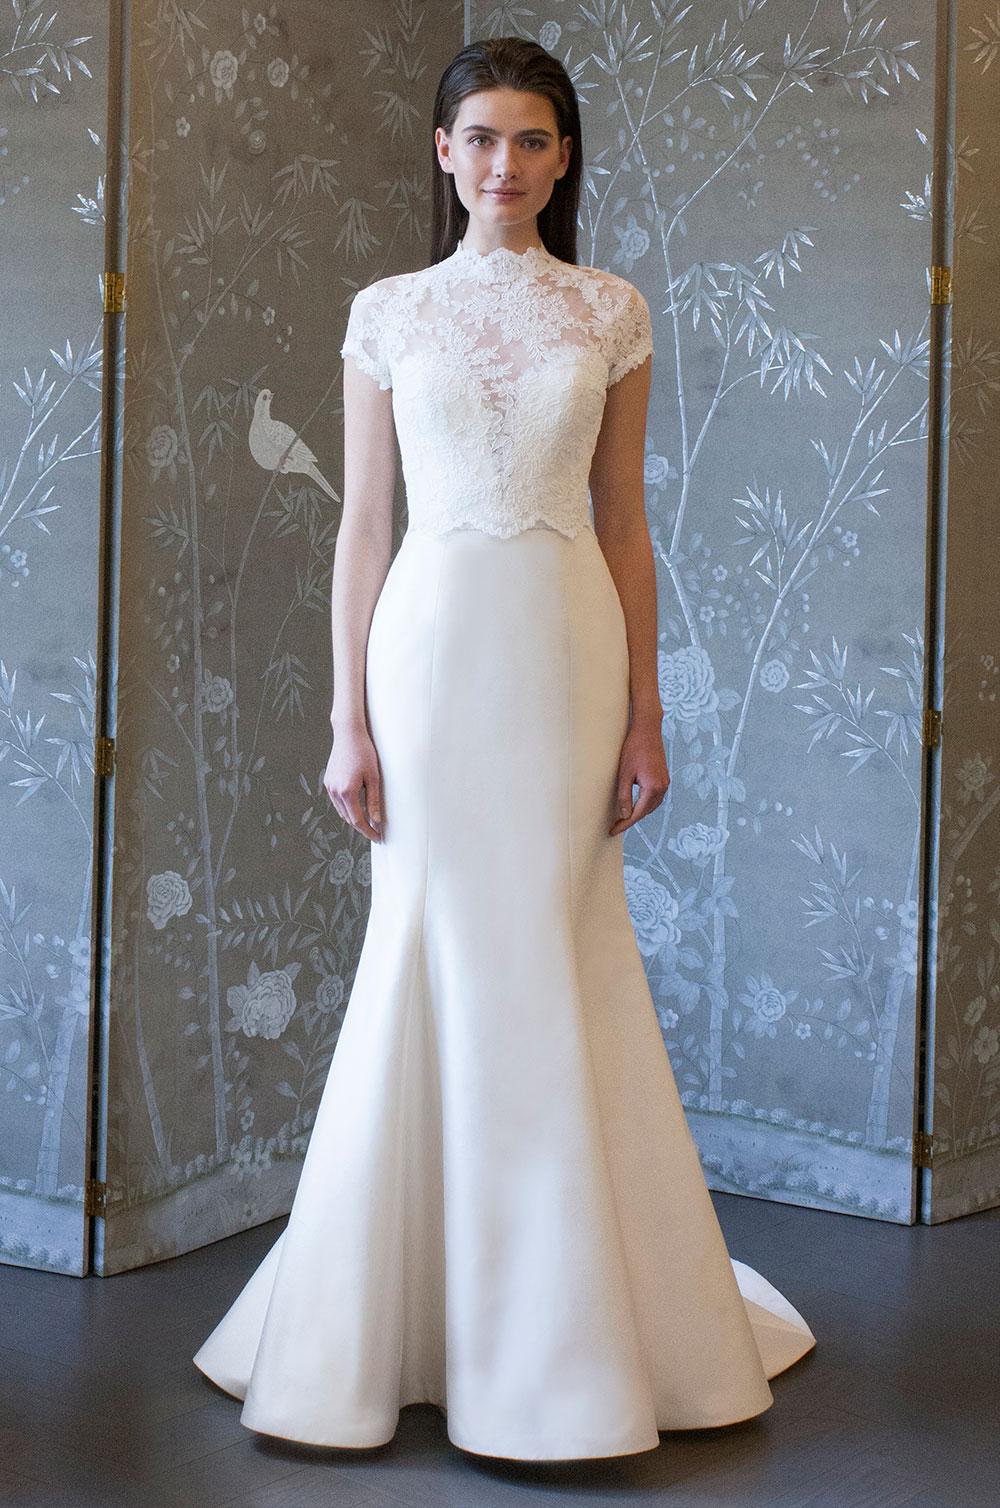 Minimalist bride: Legends-by-Romona-Keveza